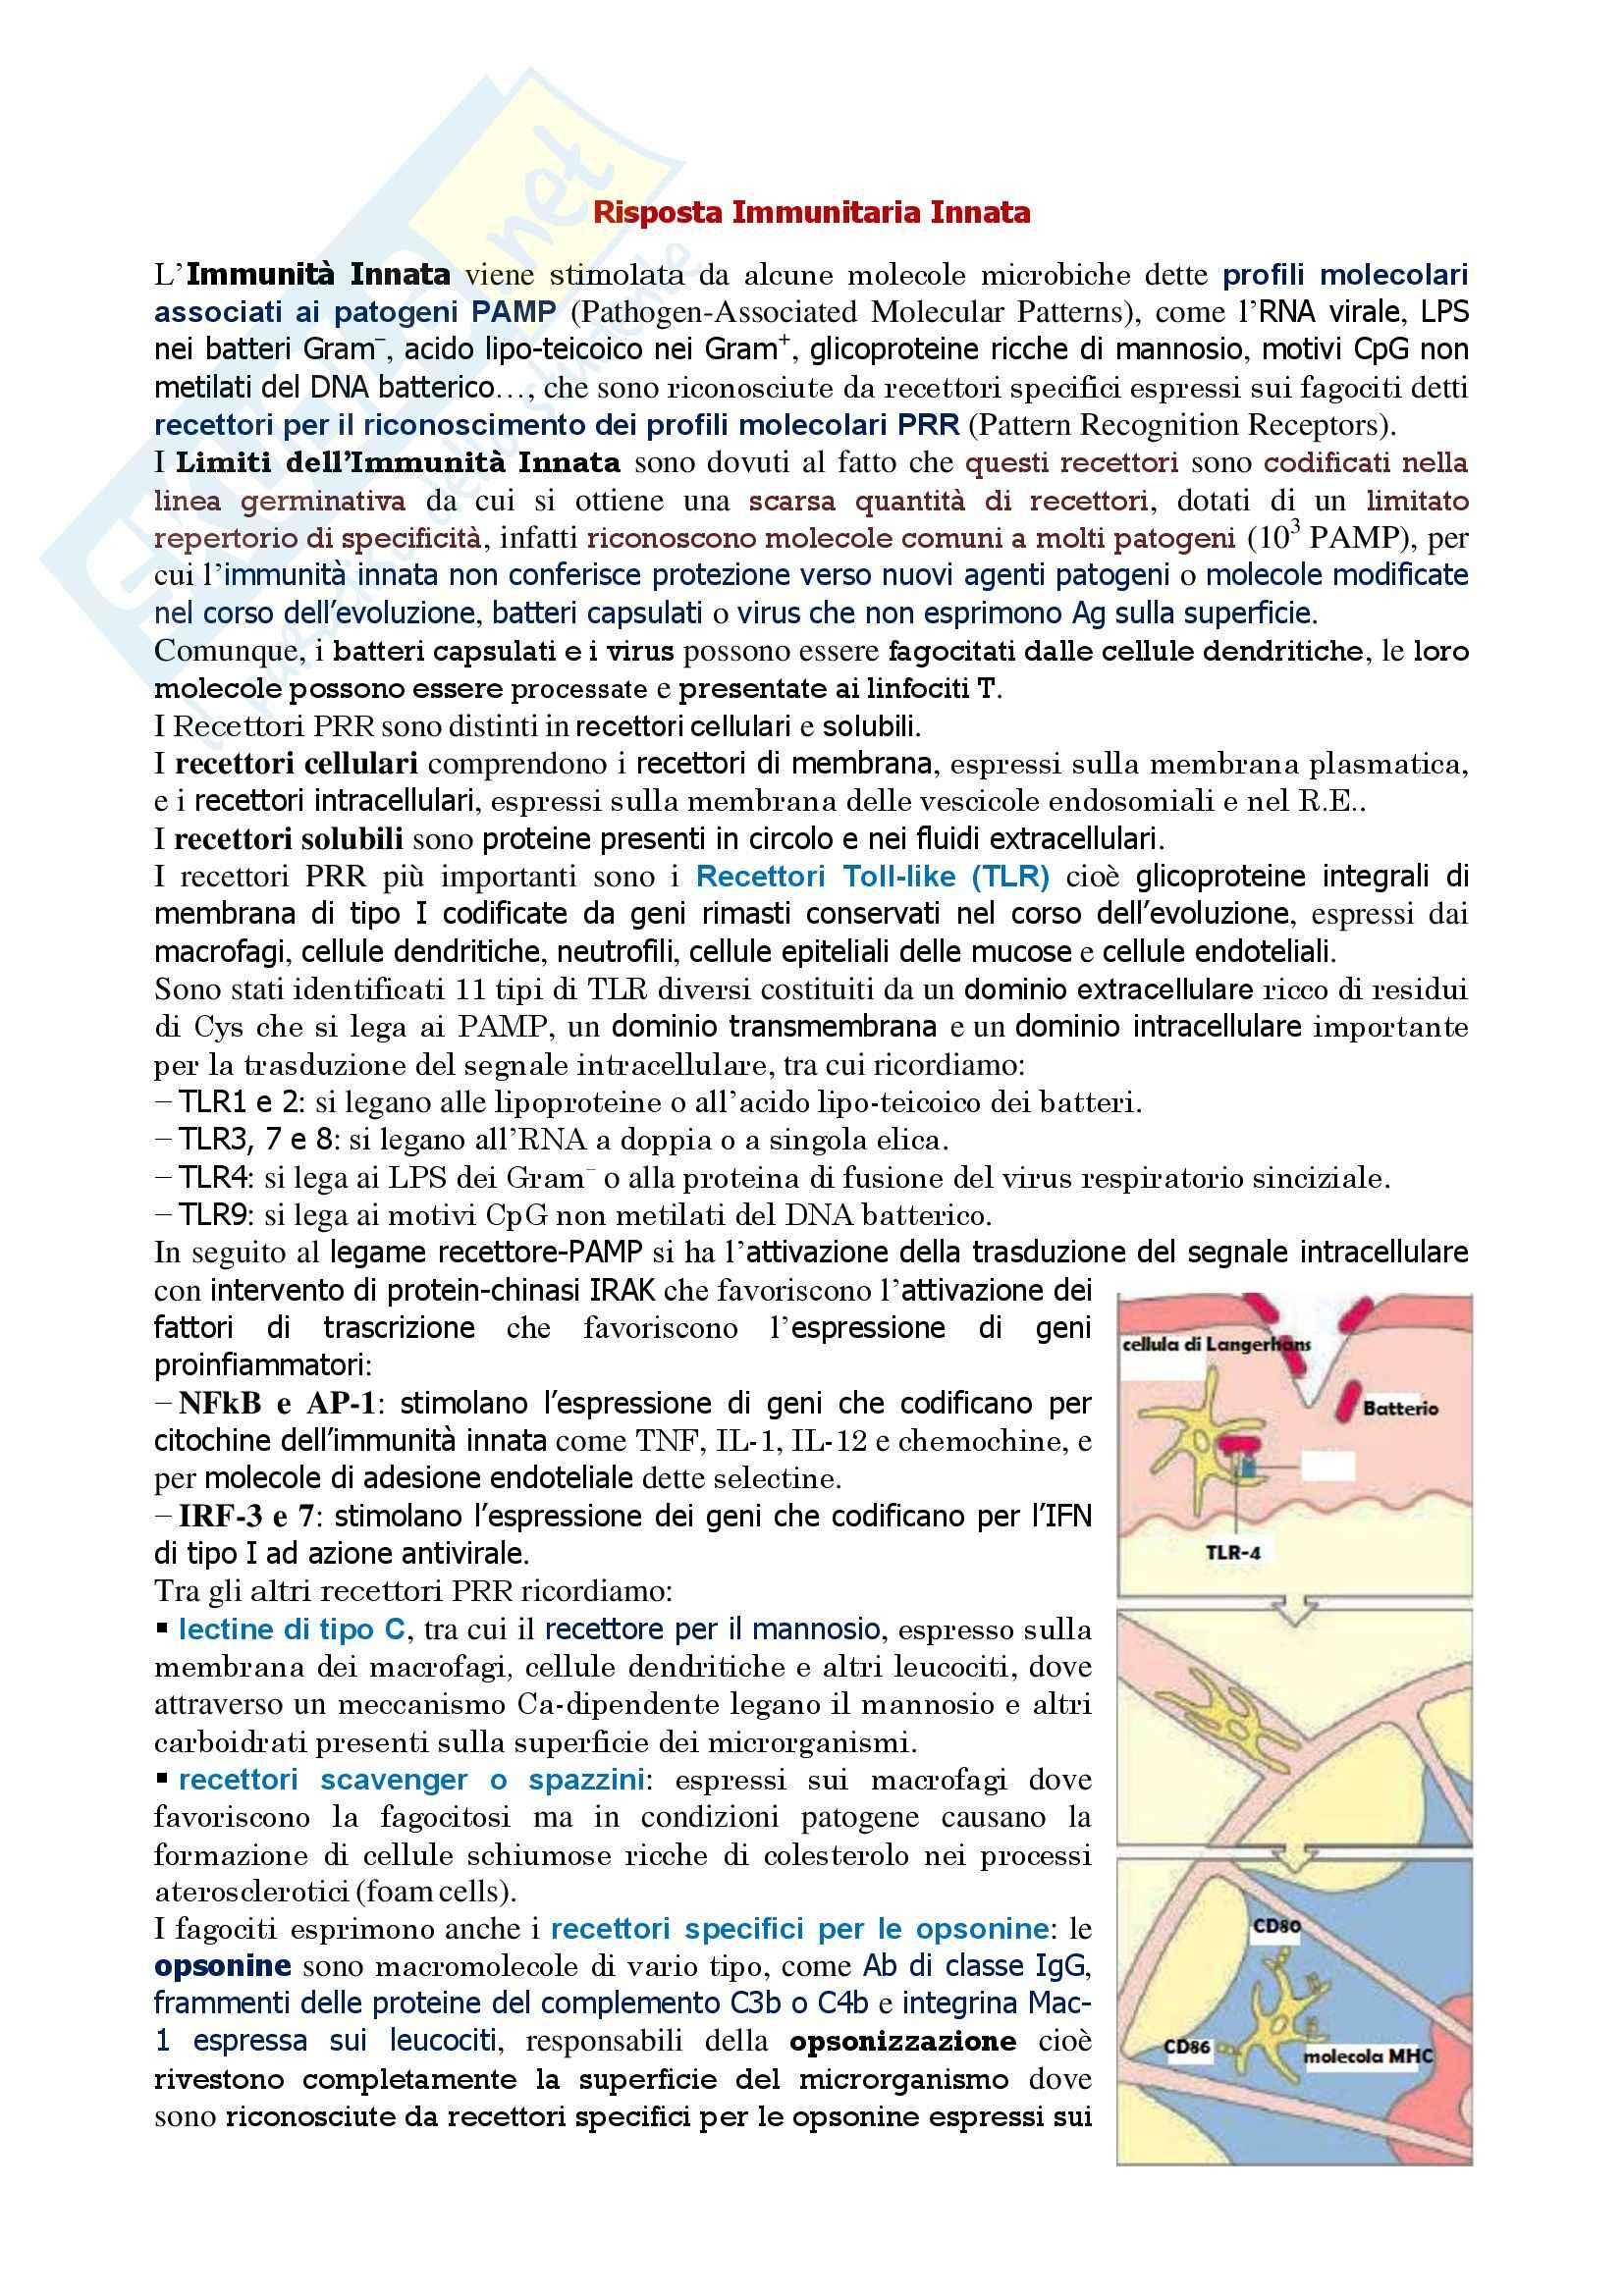 Immunologia - risposta immunitaria innata